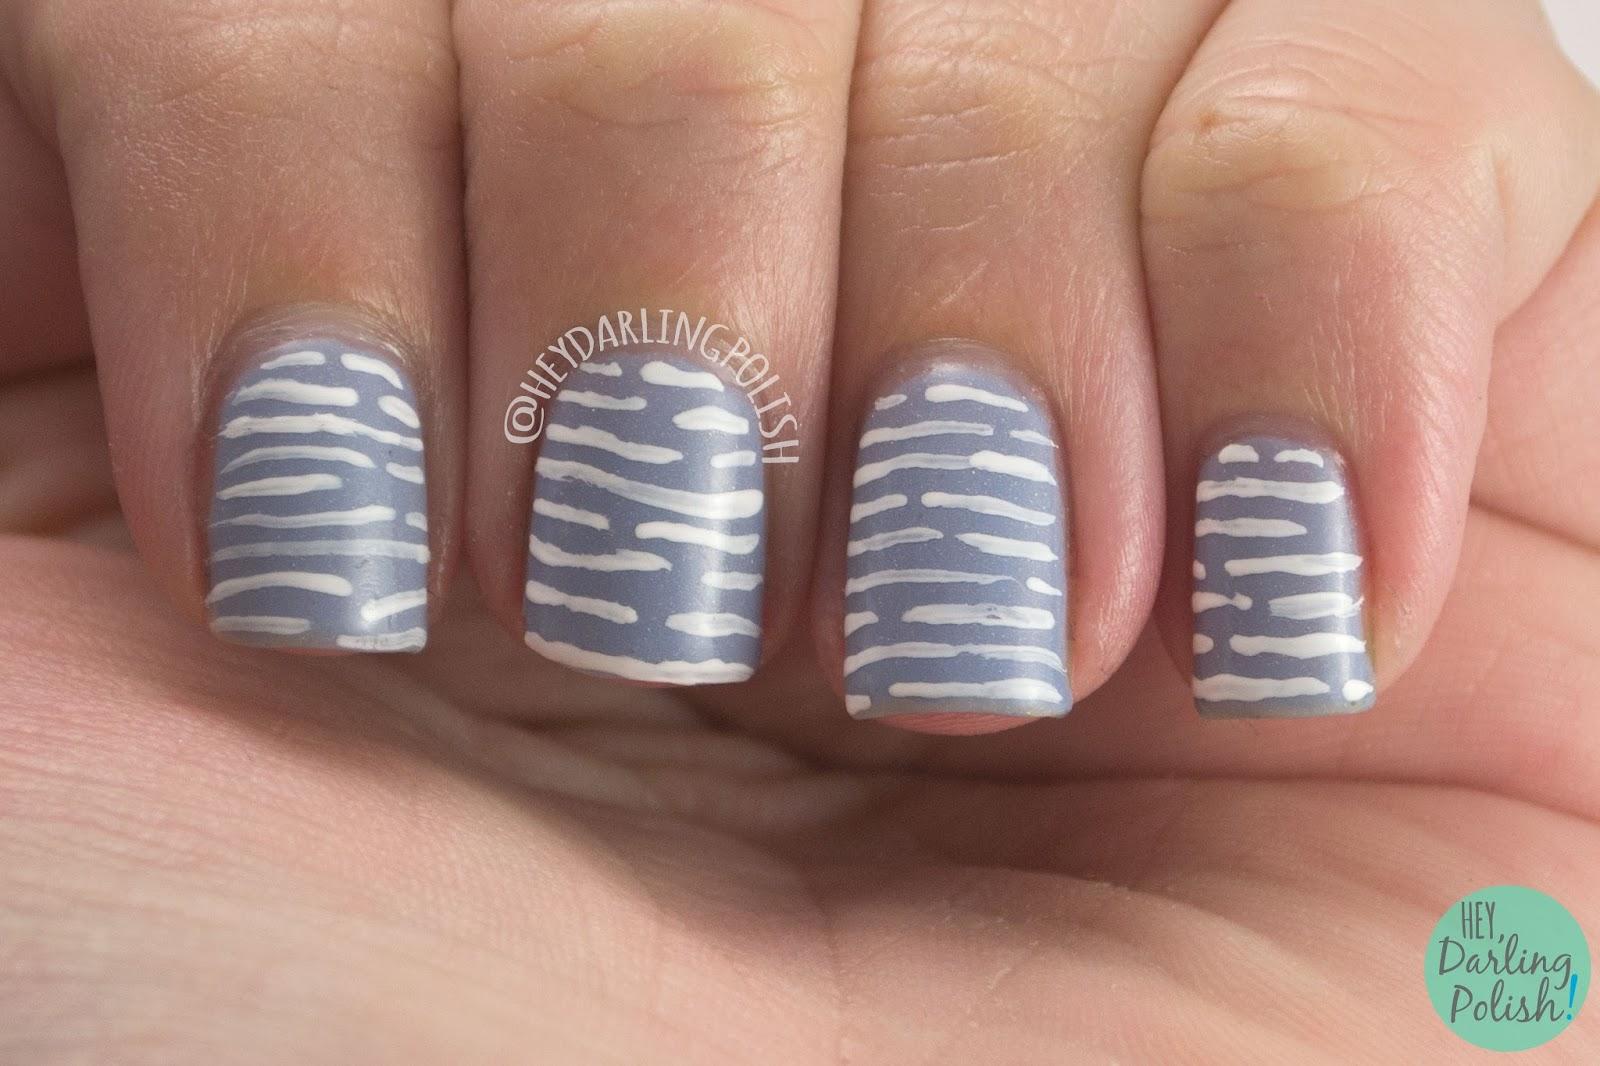 Hey, Darling Polish!: Black Dahlia Lacquer Nail Art